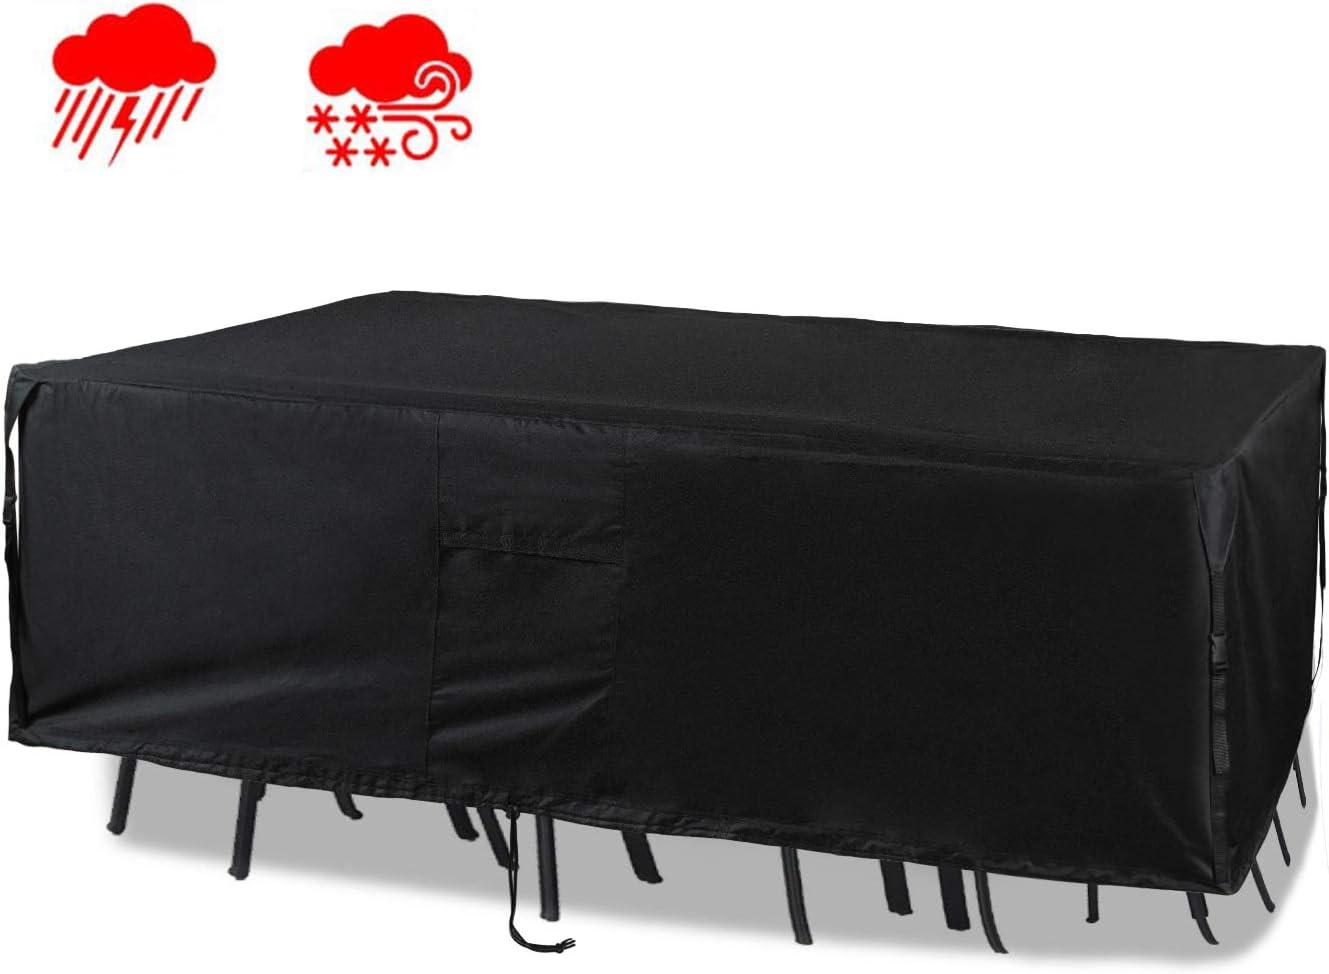 "Chutsang Patio Furniture Set Cover Veranda Rectangular Lawn Table Cover, 600D PVC Durable Square Heavy Duty and Waterproof - 128"" L x 82"" W x 24"" H"